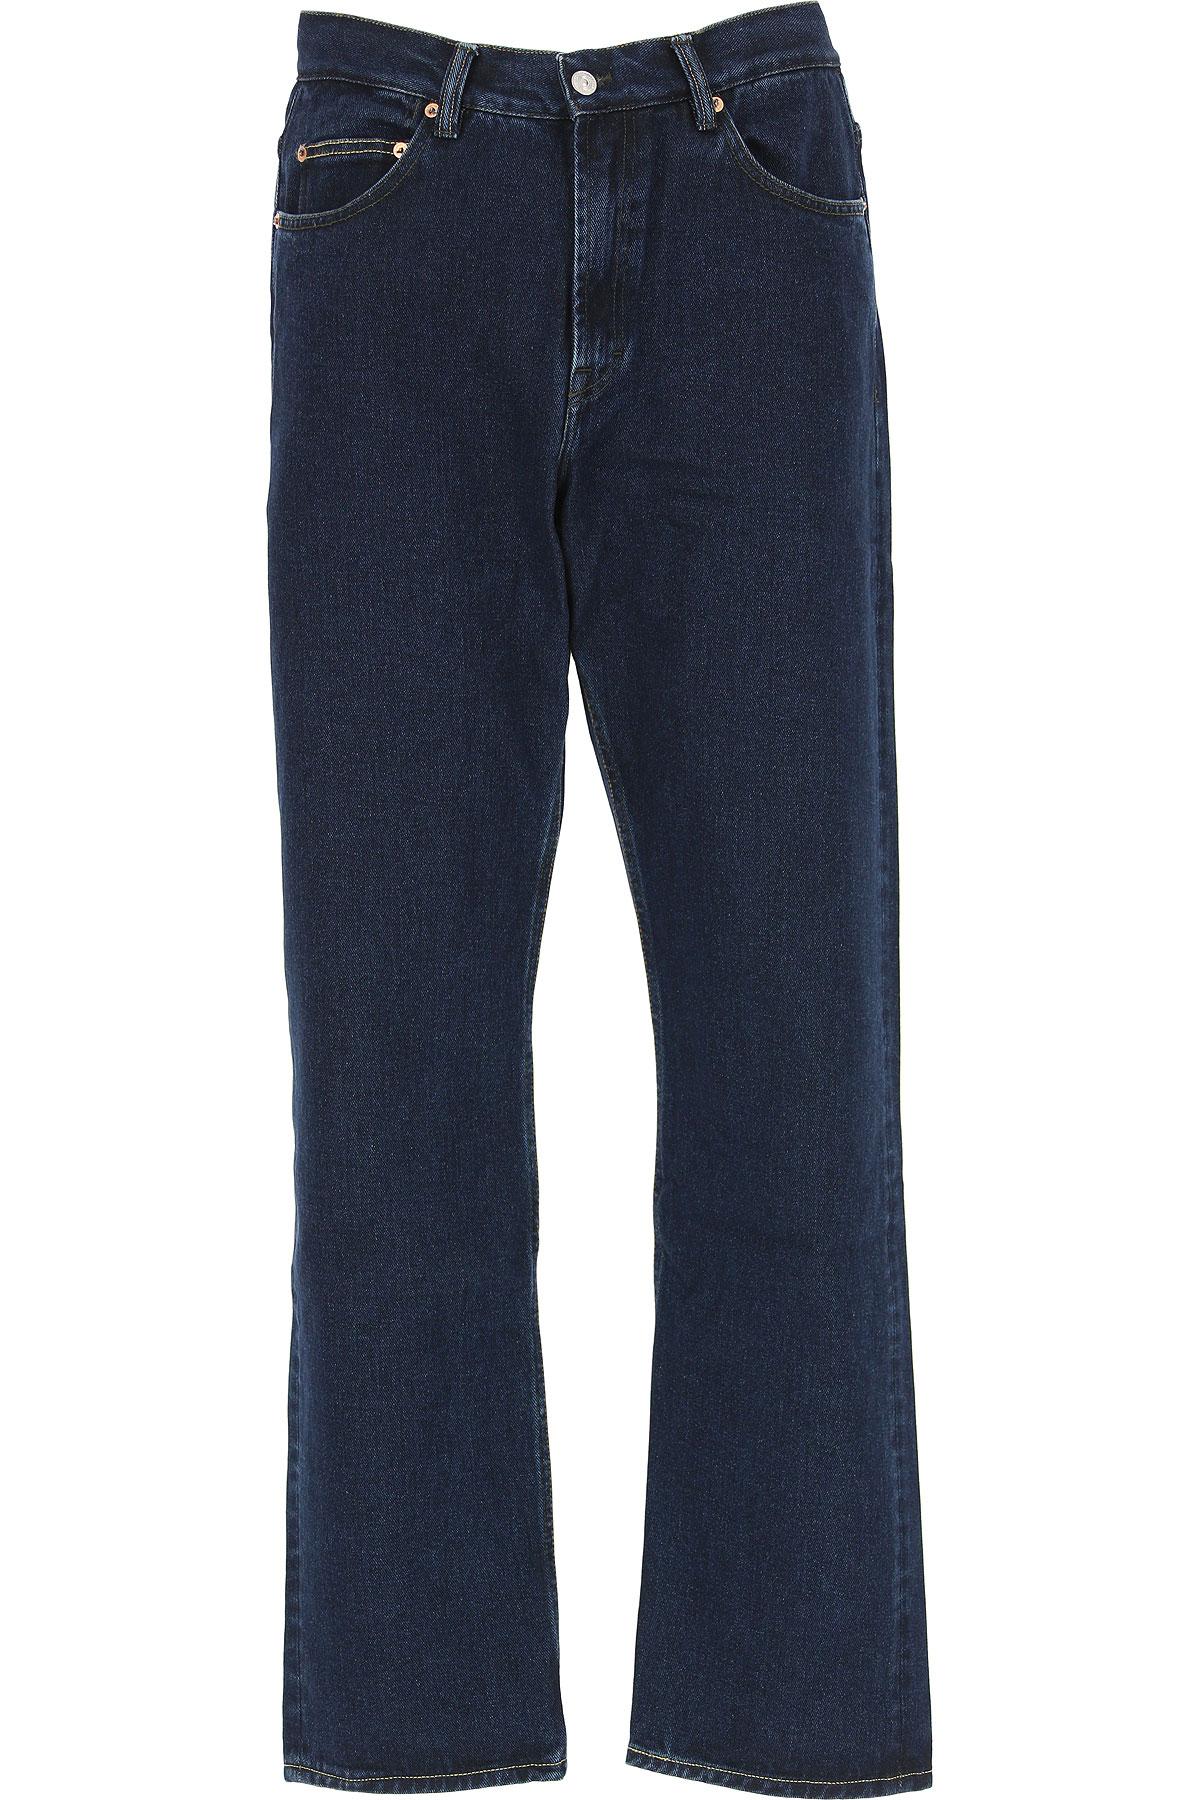 Image of Our Legacy Jeans, Denim Blue, Cotton, 2017, 31 32 33 34